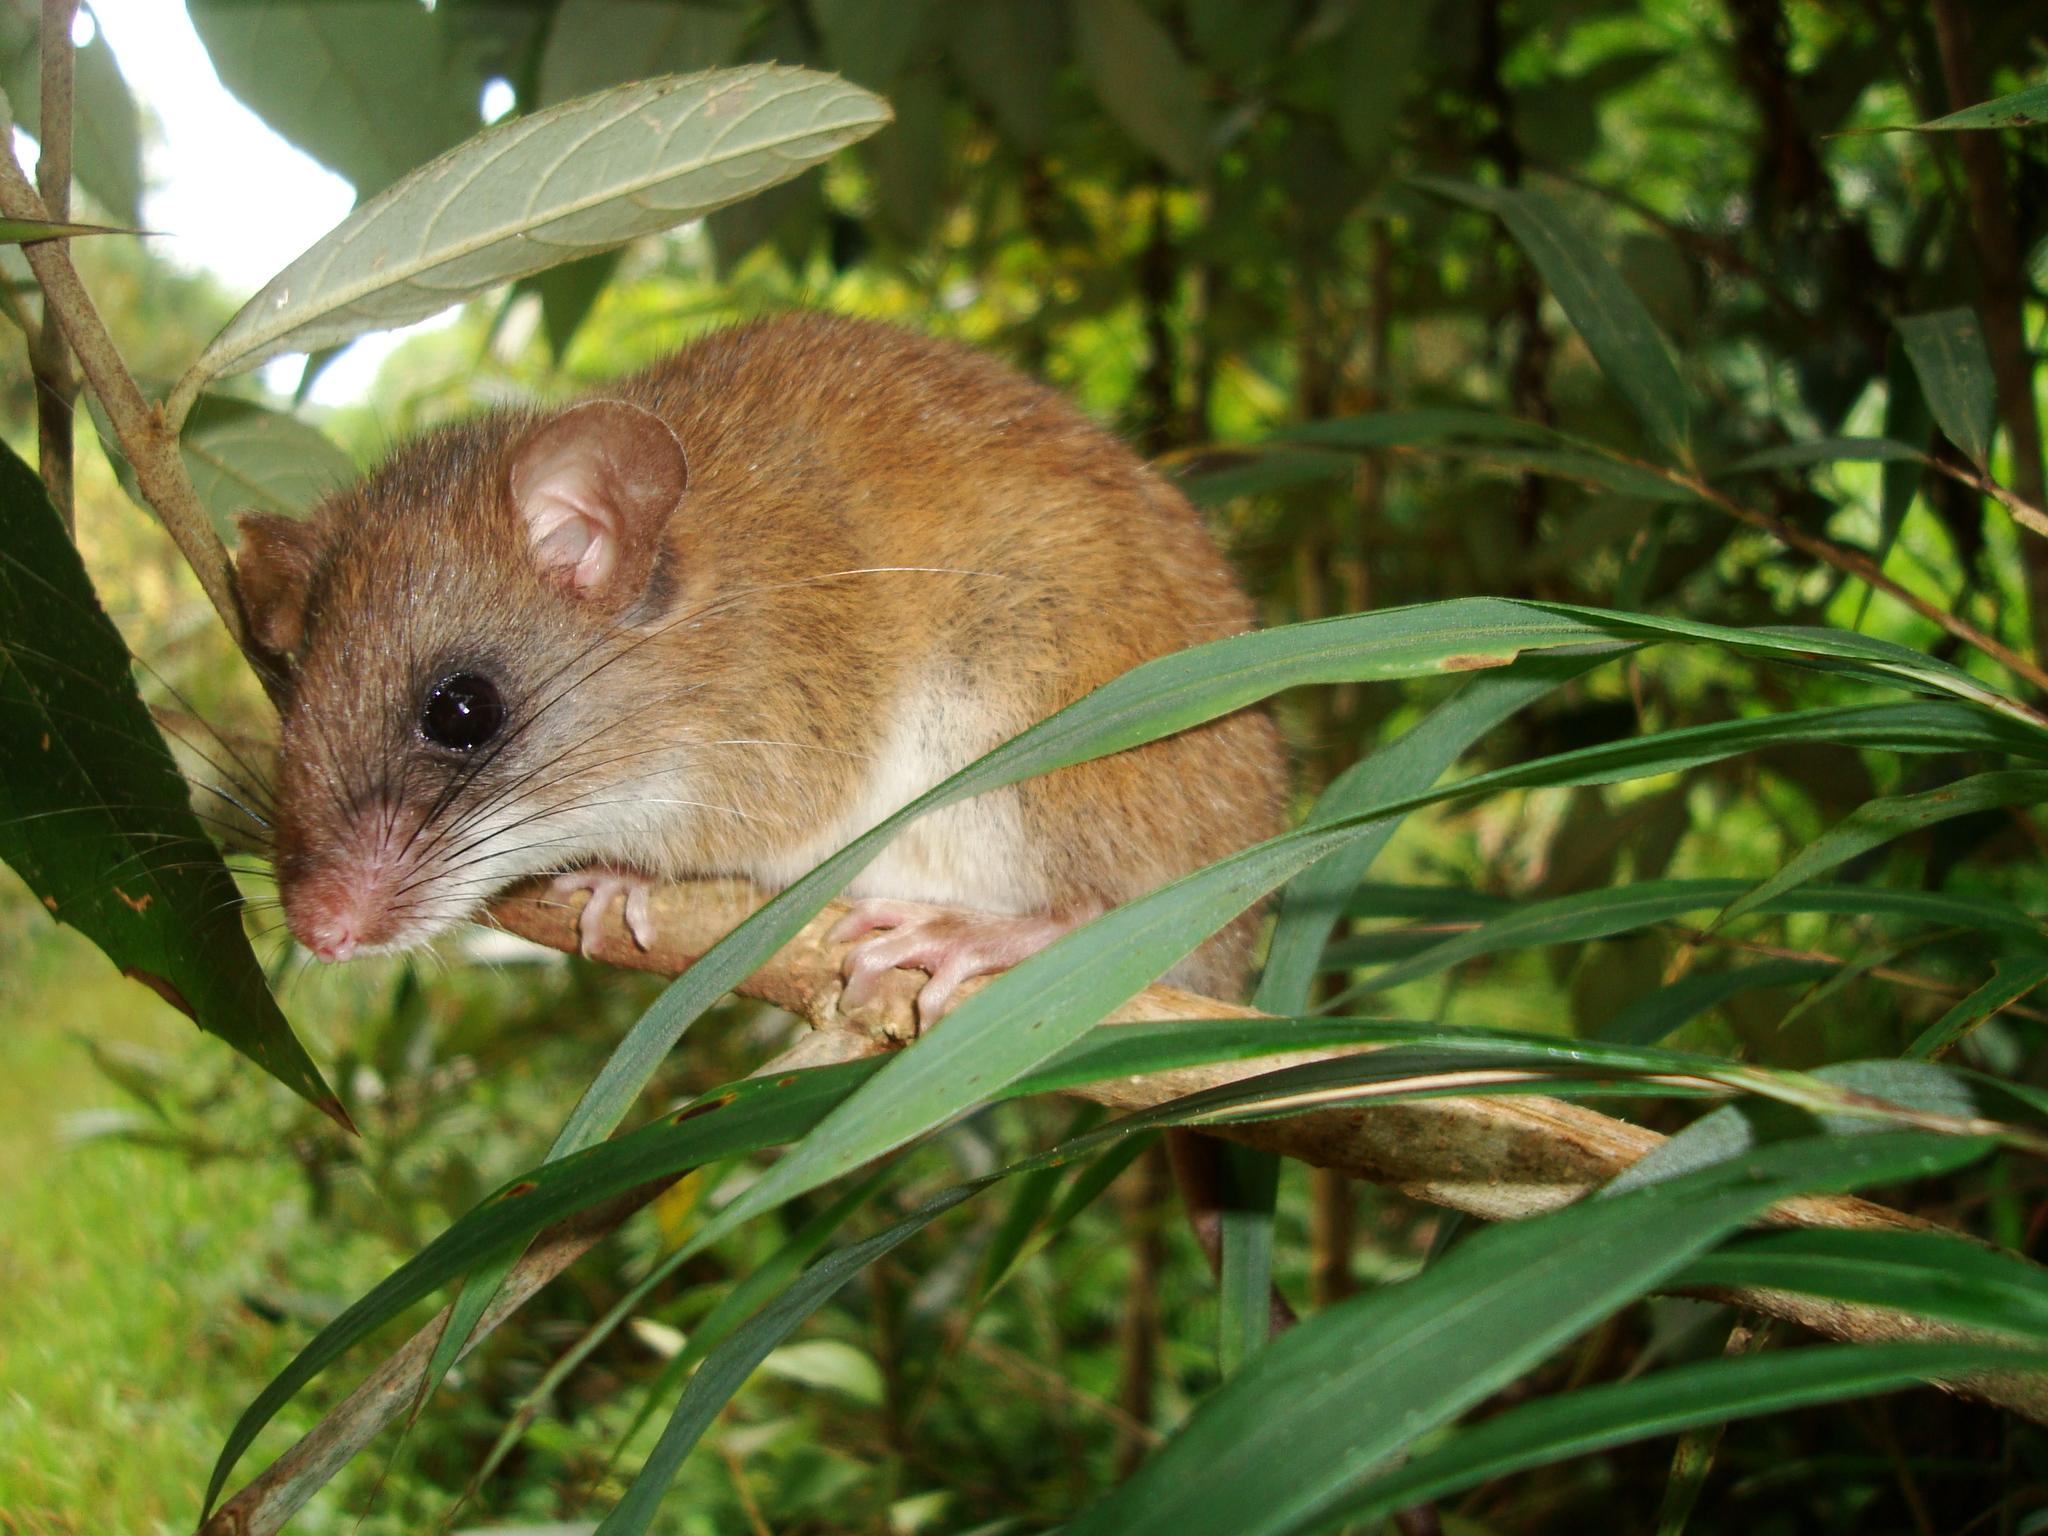 sanibel-rice-rat-everglades-tours2.jpg